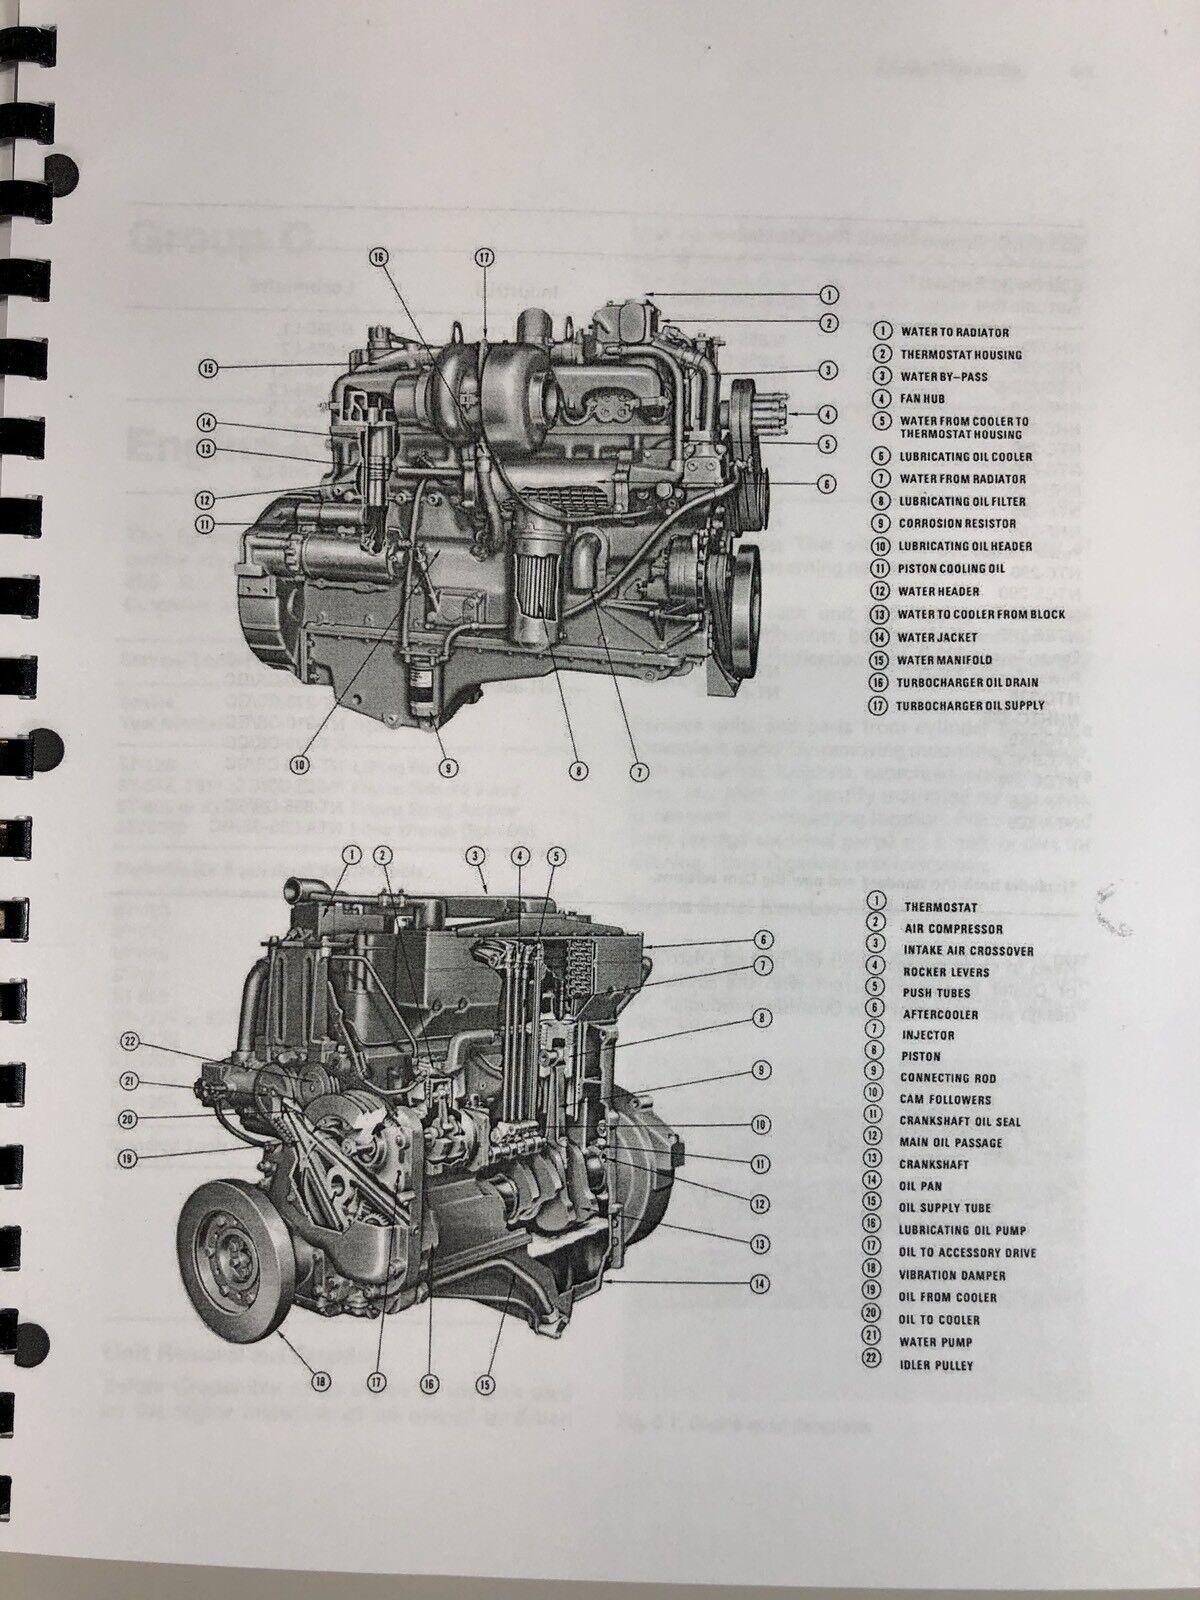 Cummins 335 350 365 400 Engine Service Repair Manual Shop Overhaul 855ci |  eBay